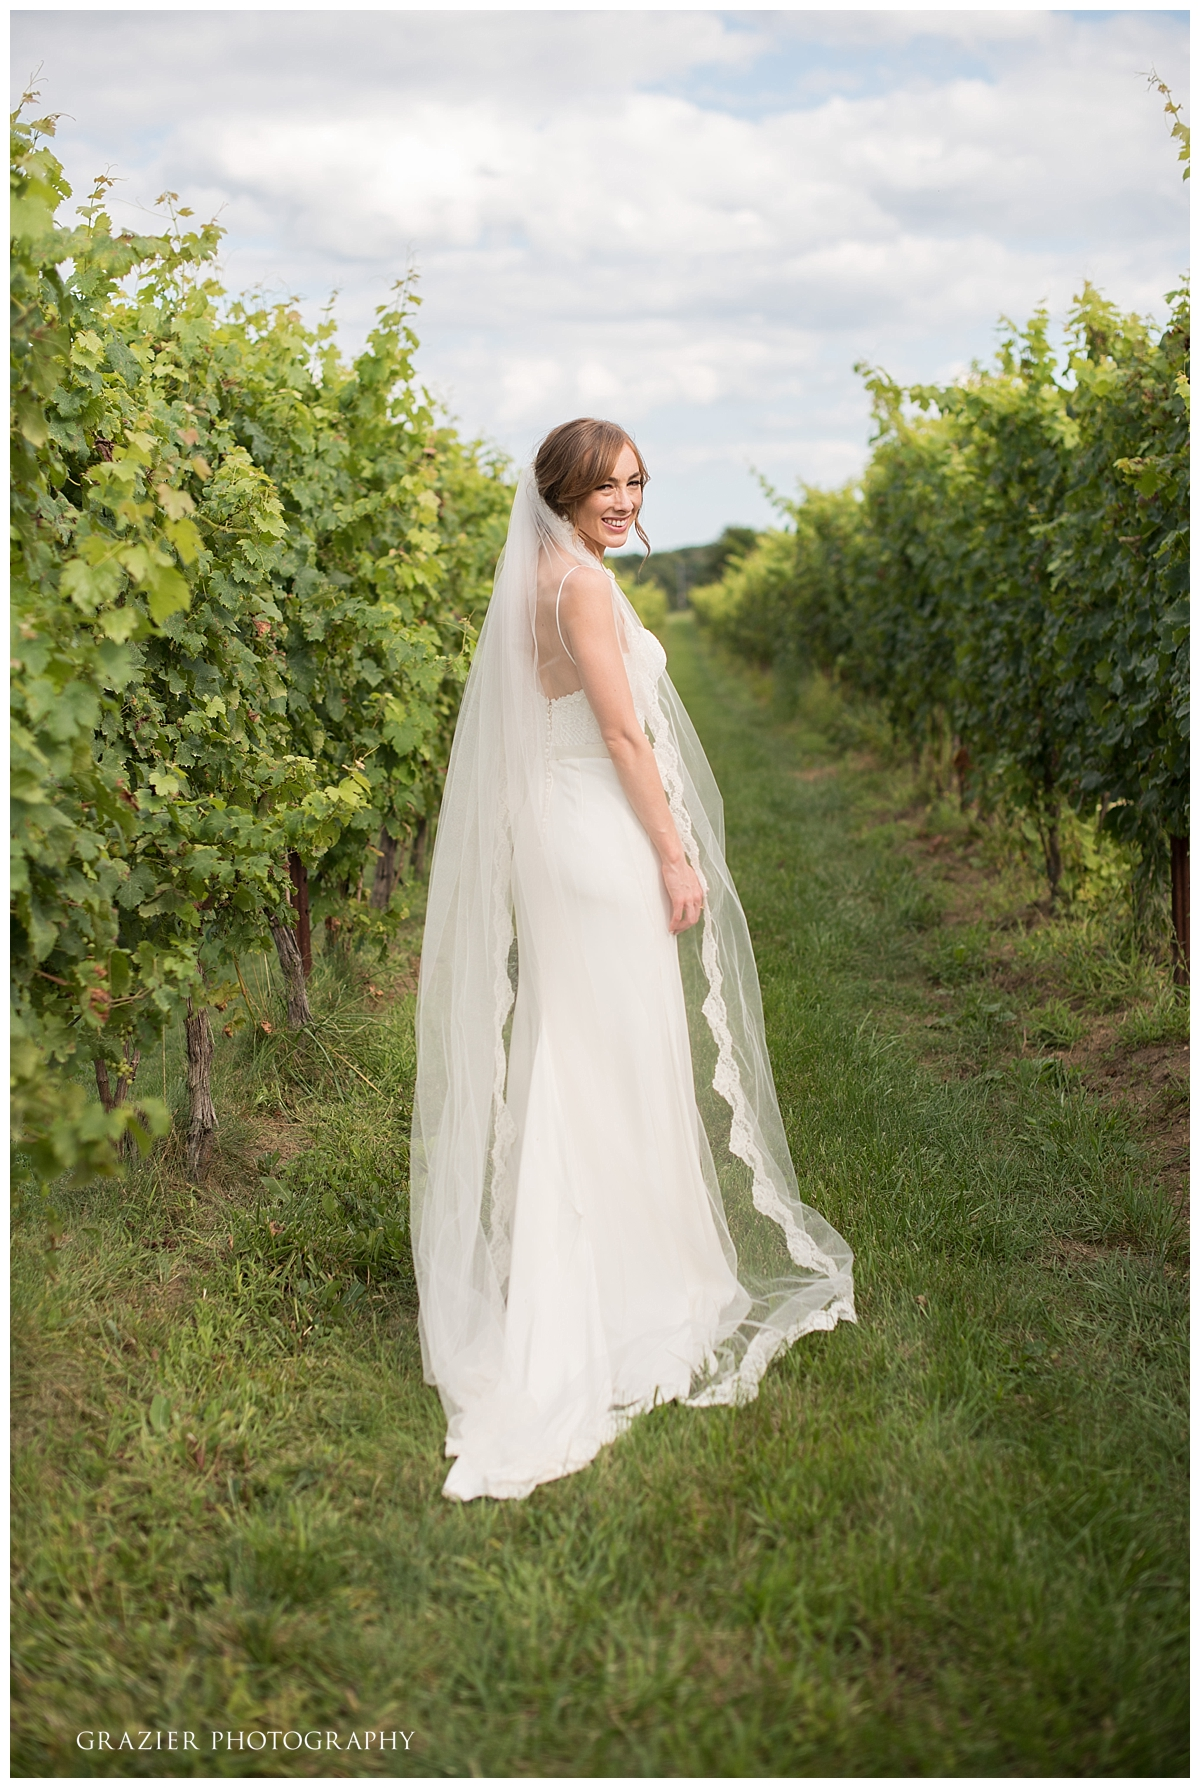 Saltwater Farm Vineyard Wedding Grazier Photography 170825-48_WEB.jpg